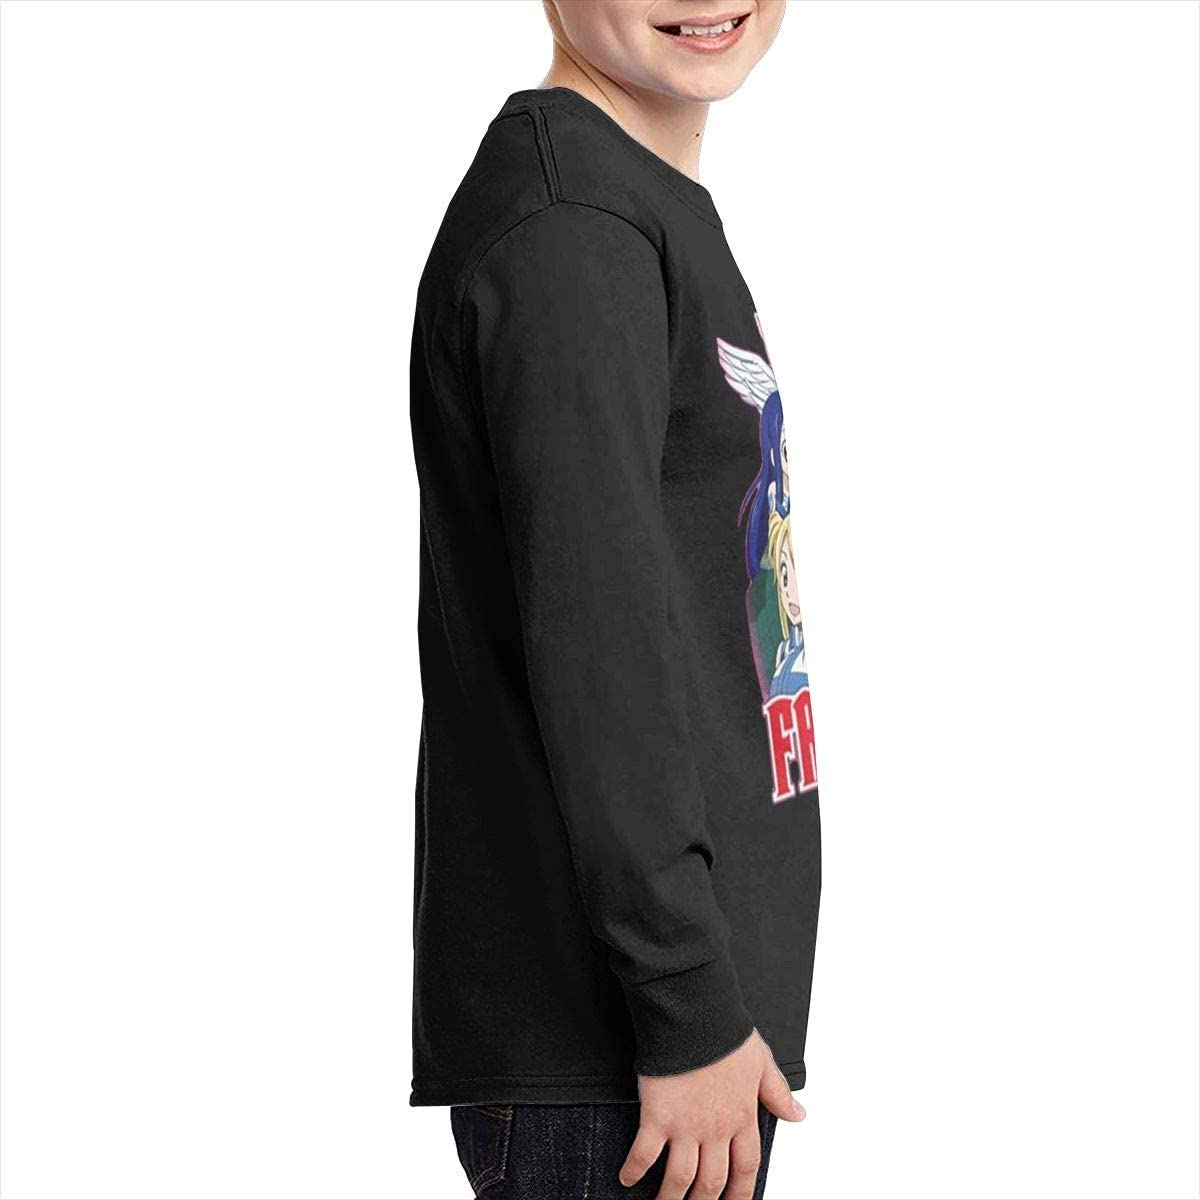 Kilsd Boys /& Girls Junior Funny Fairy Tail Anime Long Sleeve T-Shirts Black